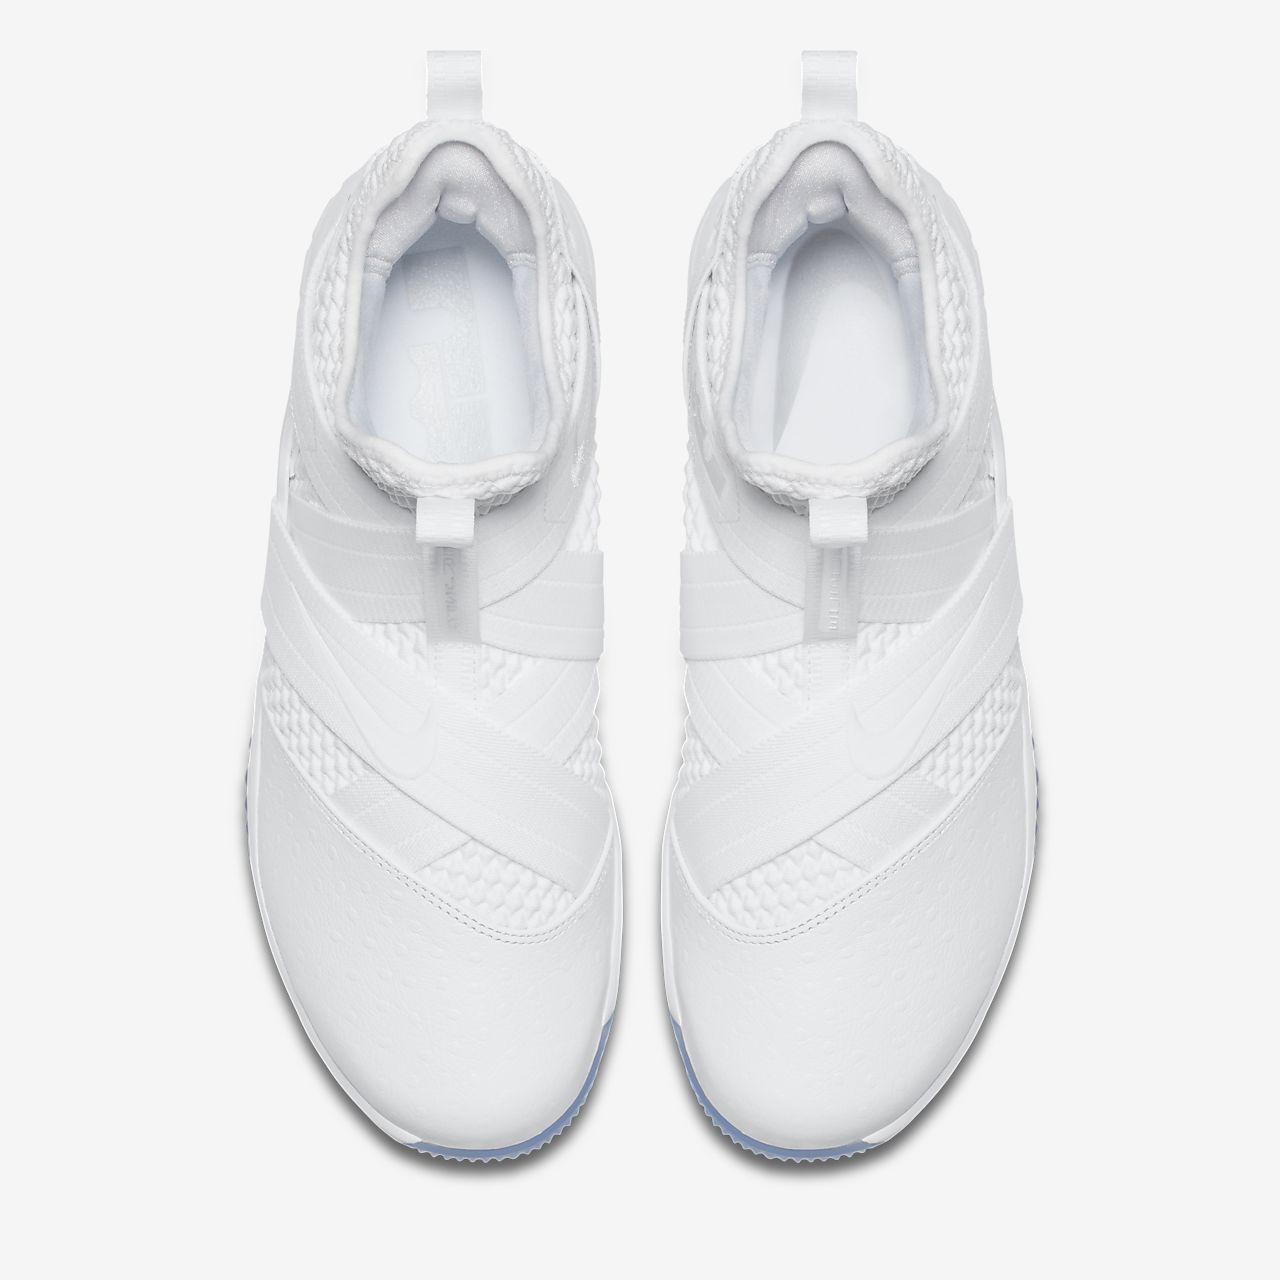 meet 4cccf 4cf48 Chaussure de basketball LeBron Soldier 12 SFG. Nike.com FR